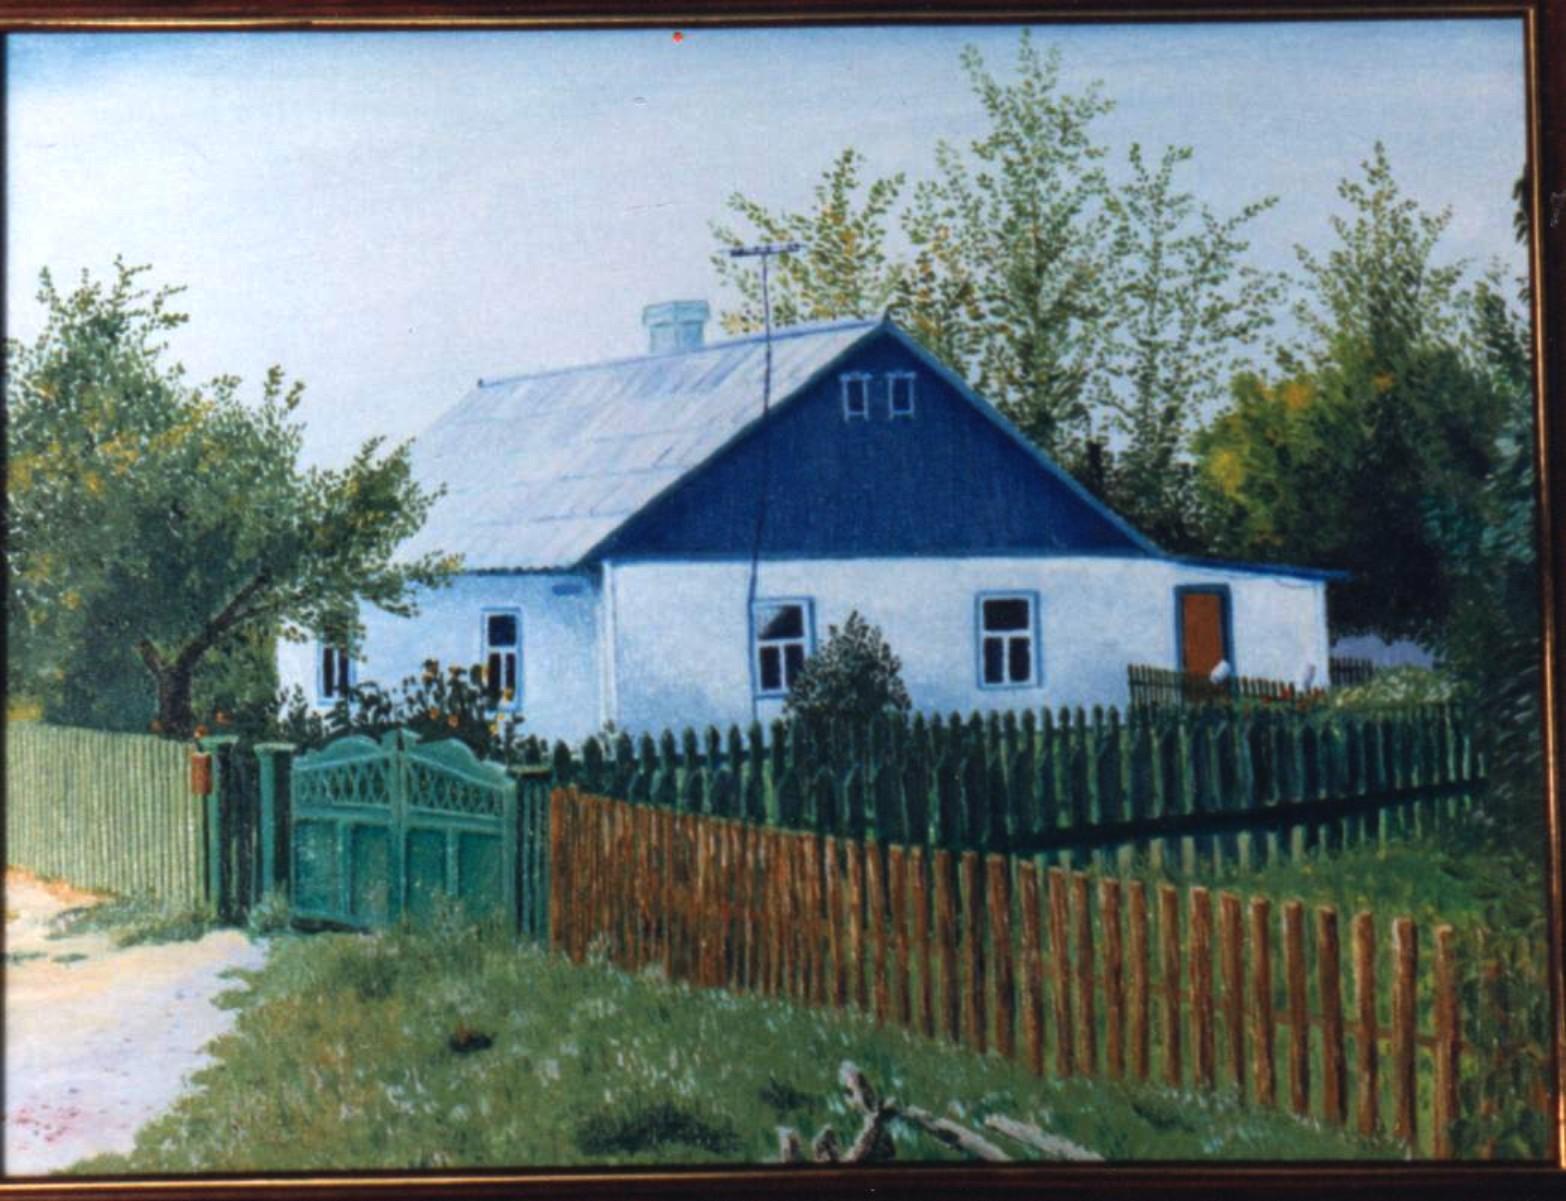 Wosmidomiki, Kasachstan, Haus